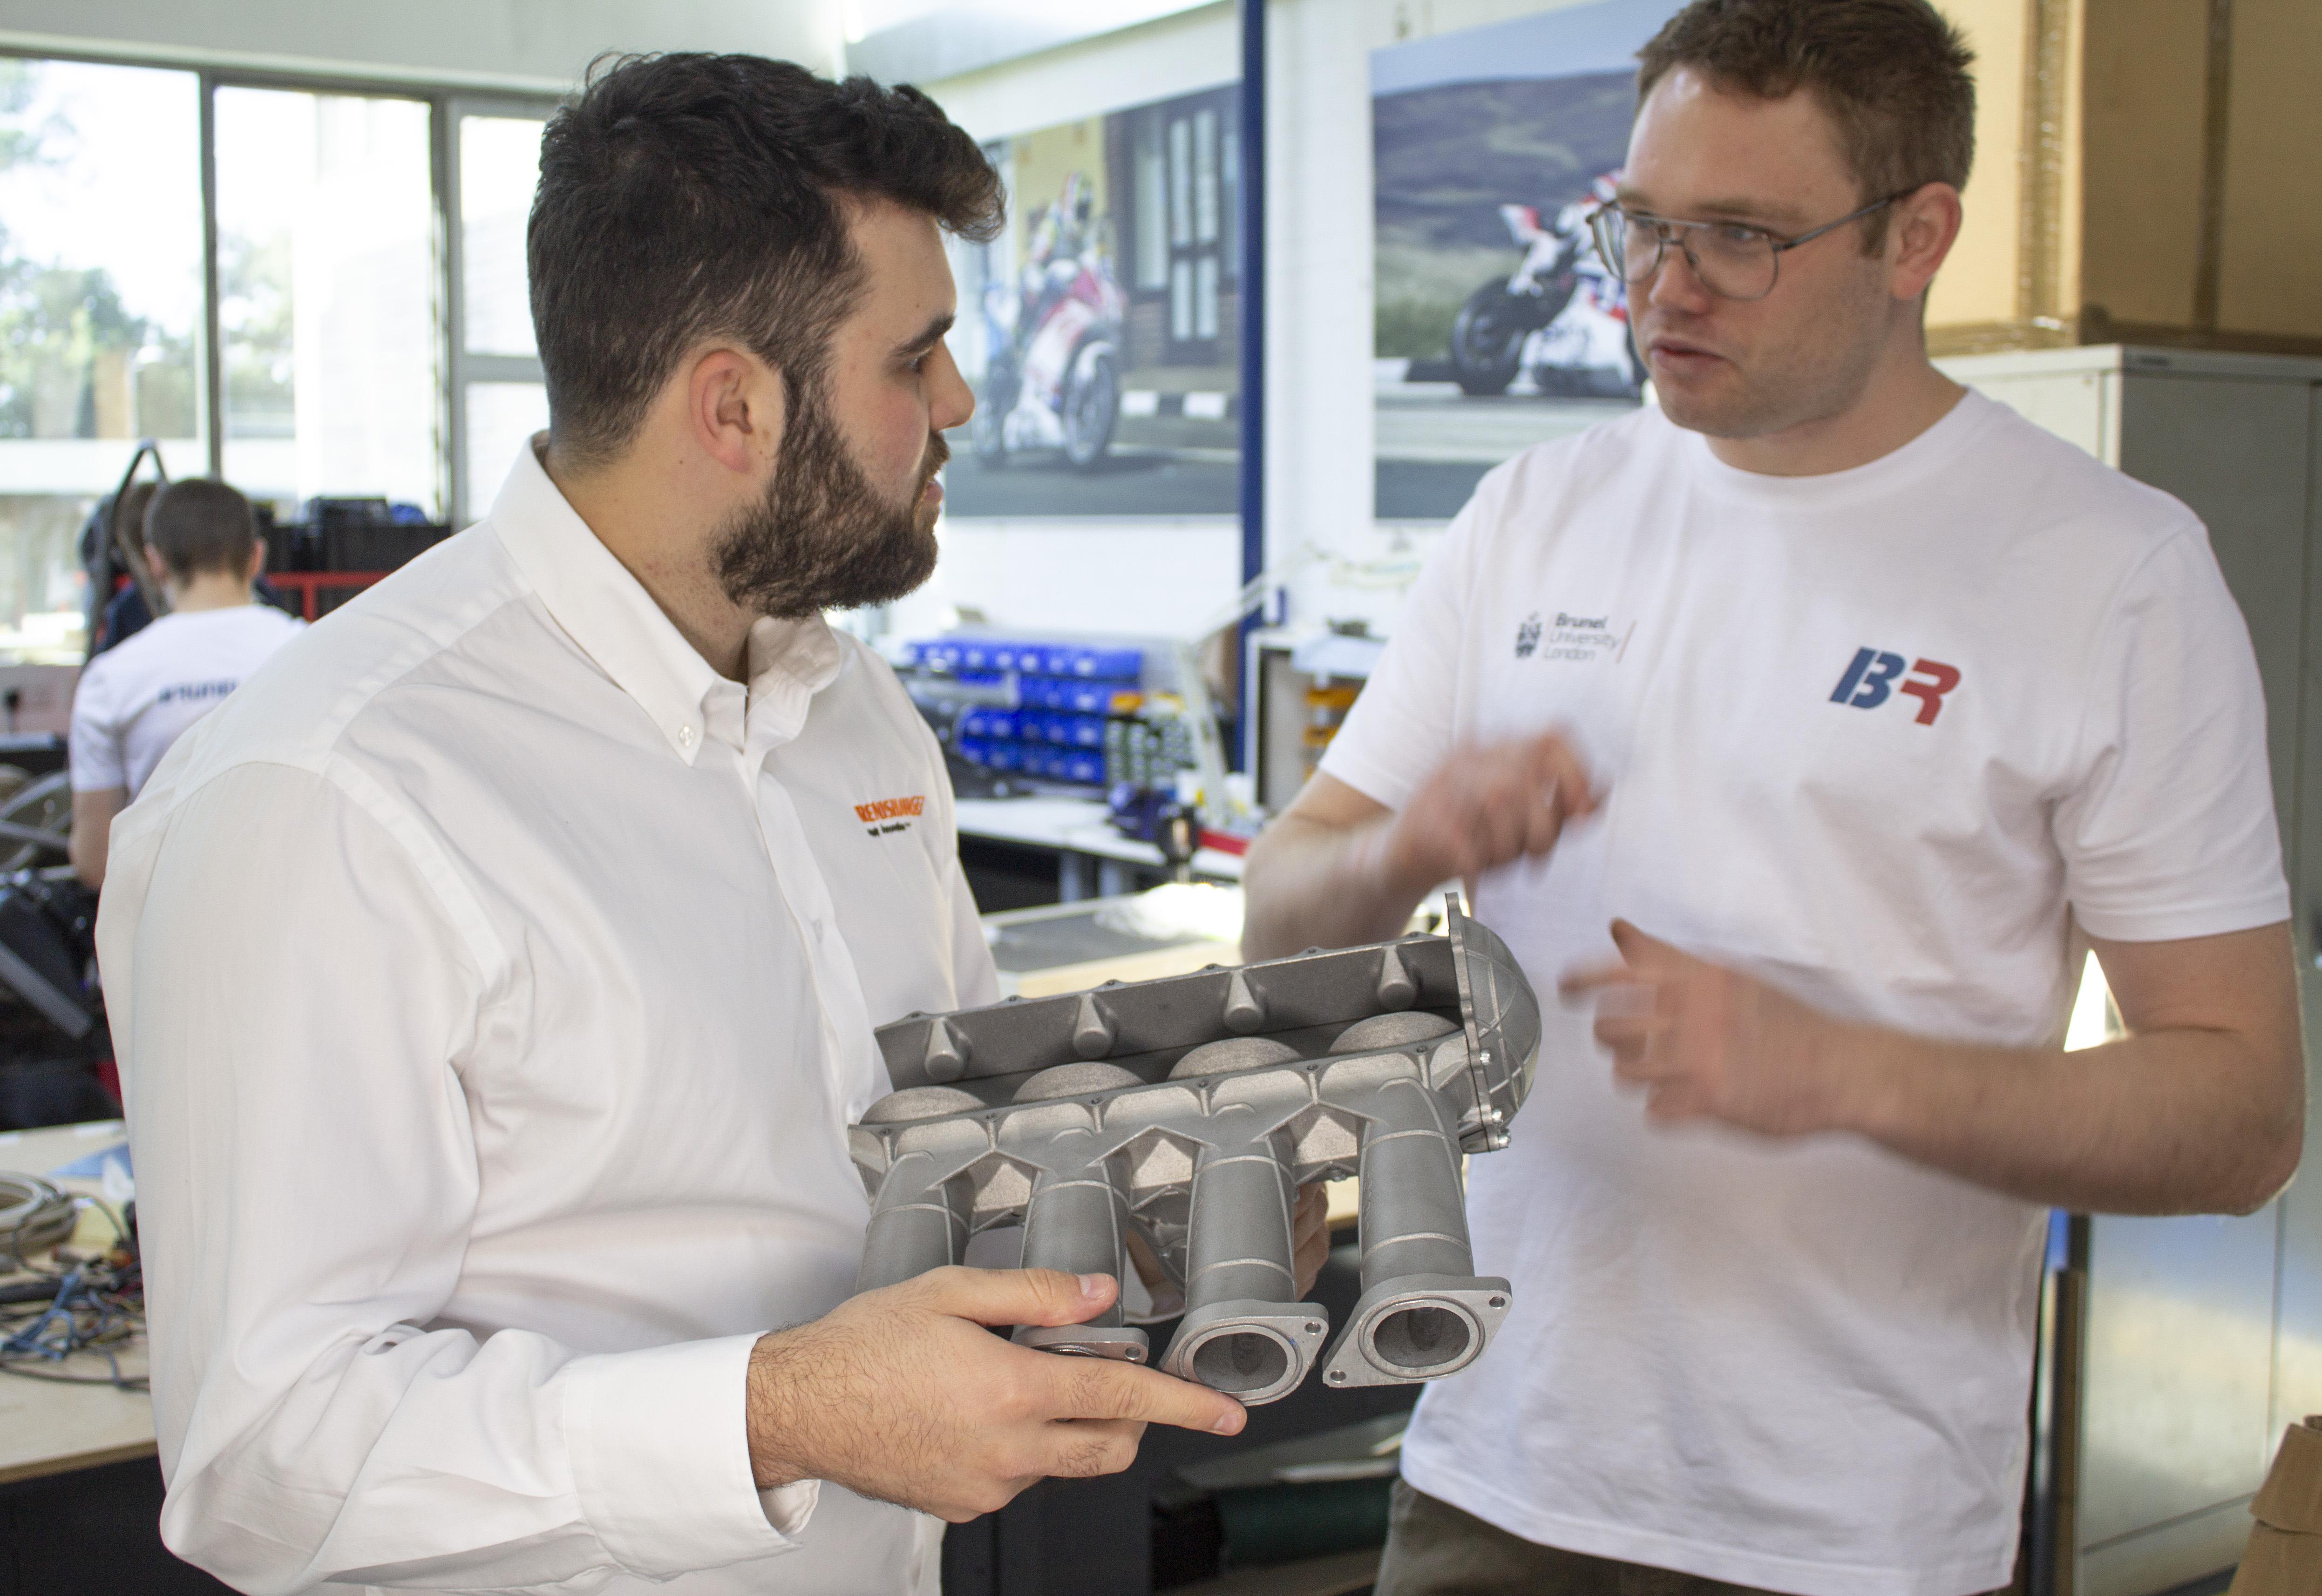 Renishaw supports Brunel Racing in Formula Student competition. Photo via Renishaw.